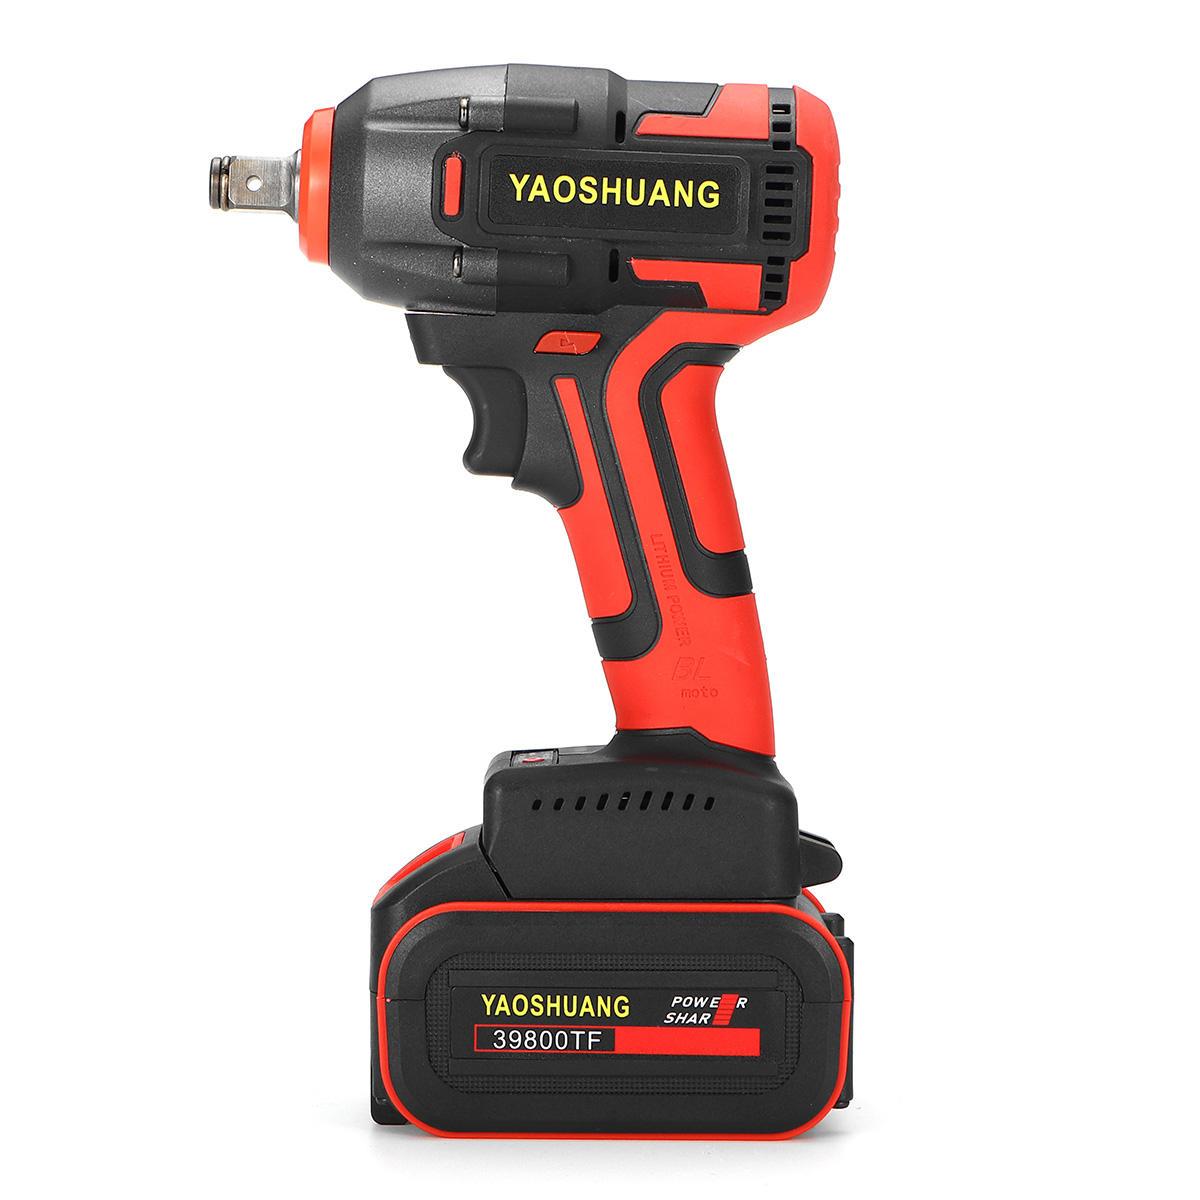 110V-220V 18000mAh/27000mAh/33000mAh Electric Cordless Brushless Impact Wrench Drill Power Repair Tools Kit